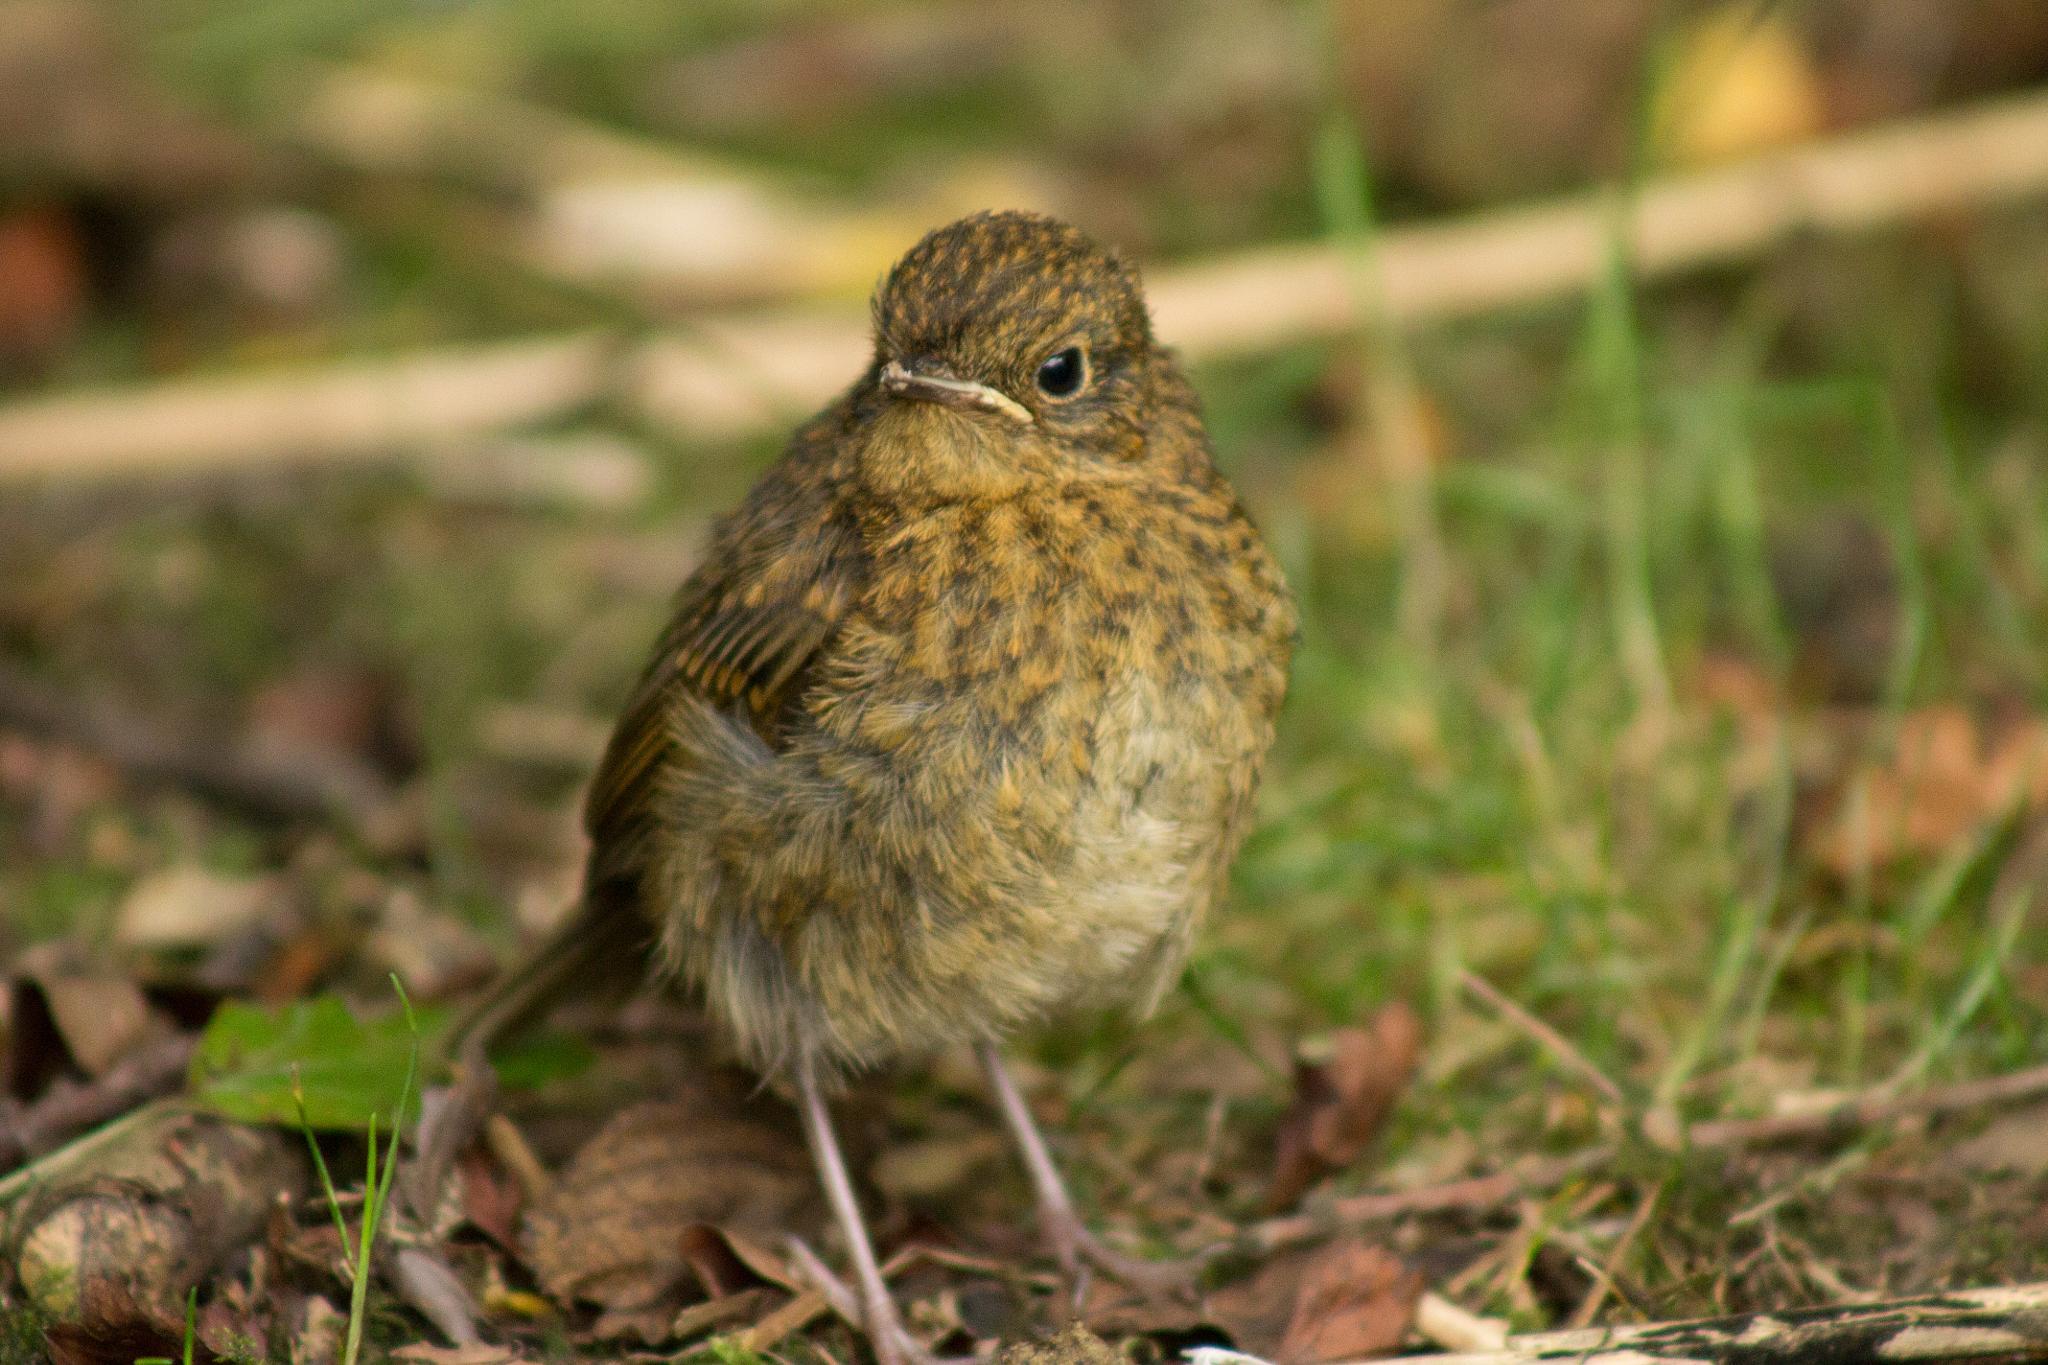 Cute little Robin by Sam Hockaday